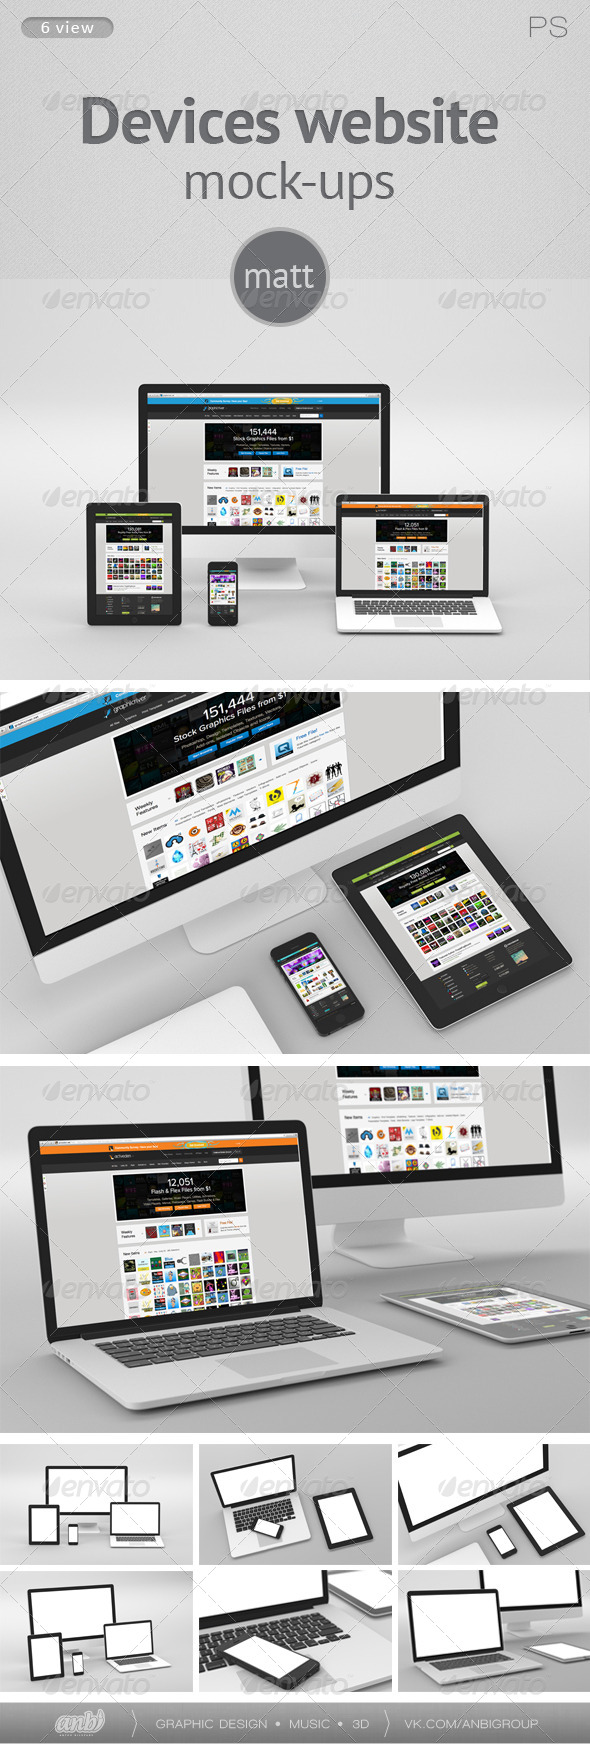 GraphicRiver Devices website Mock-ups matt 5702607